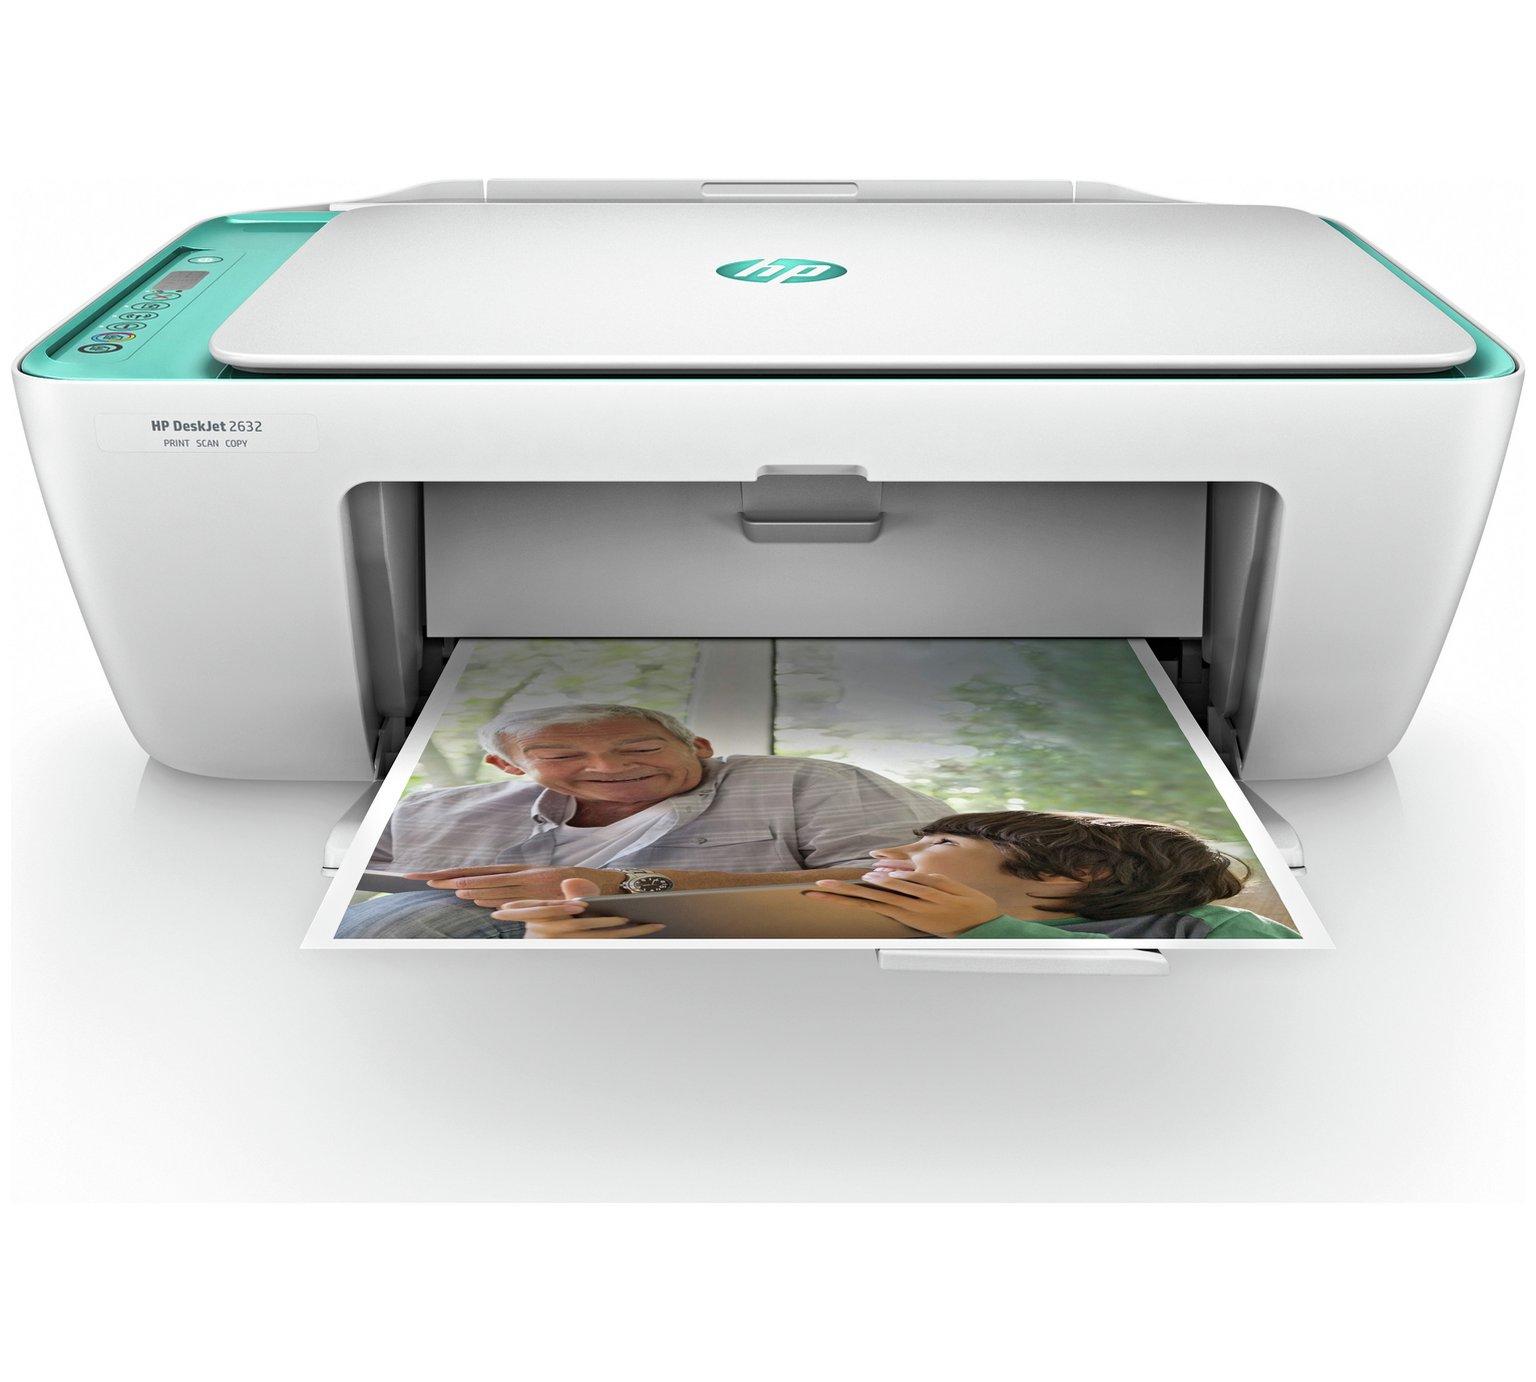 HP DeskJet 2632 Wireless All-in-One Printer